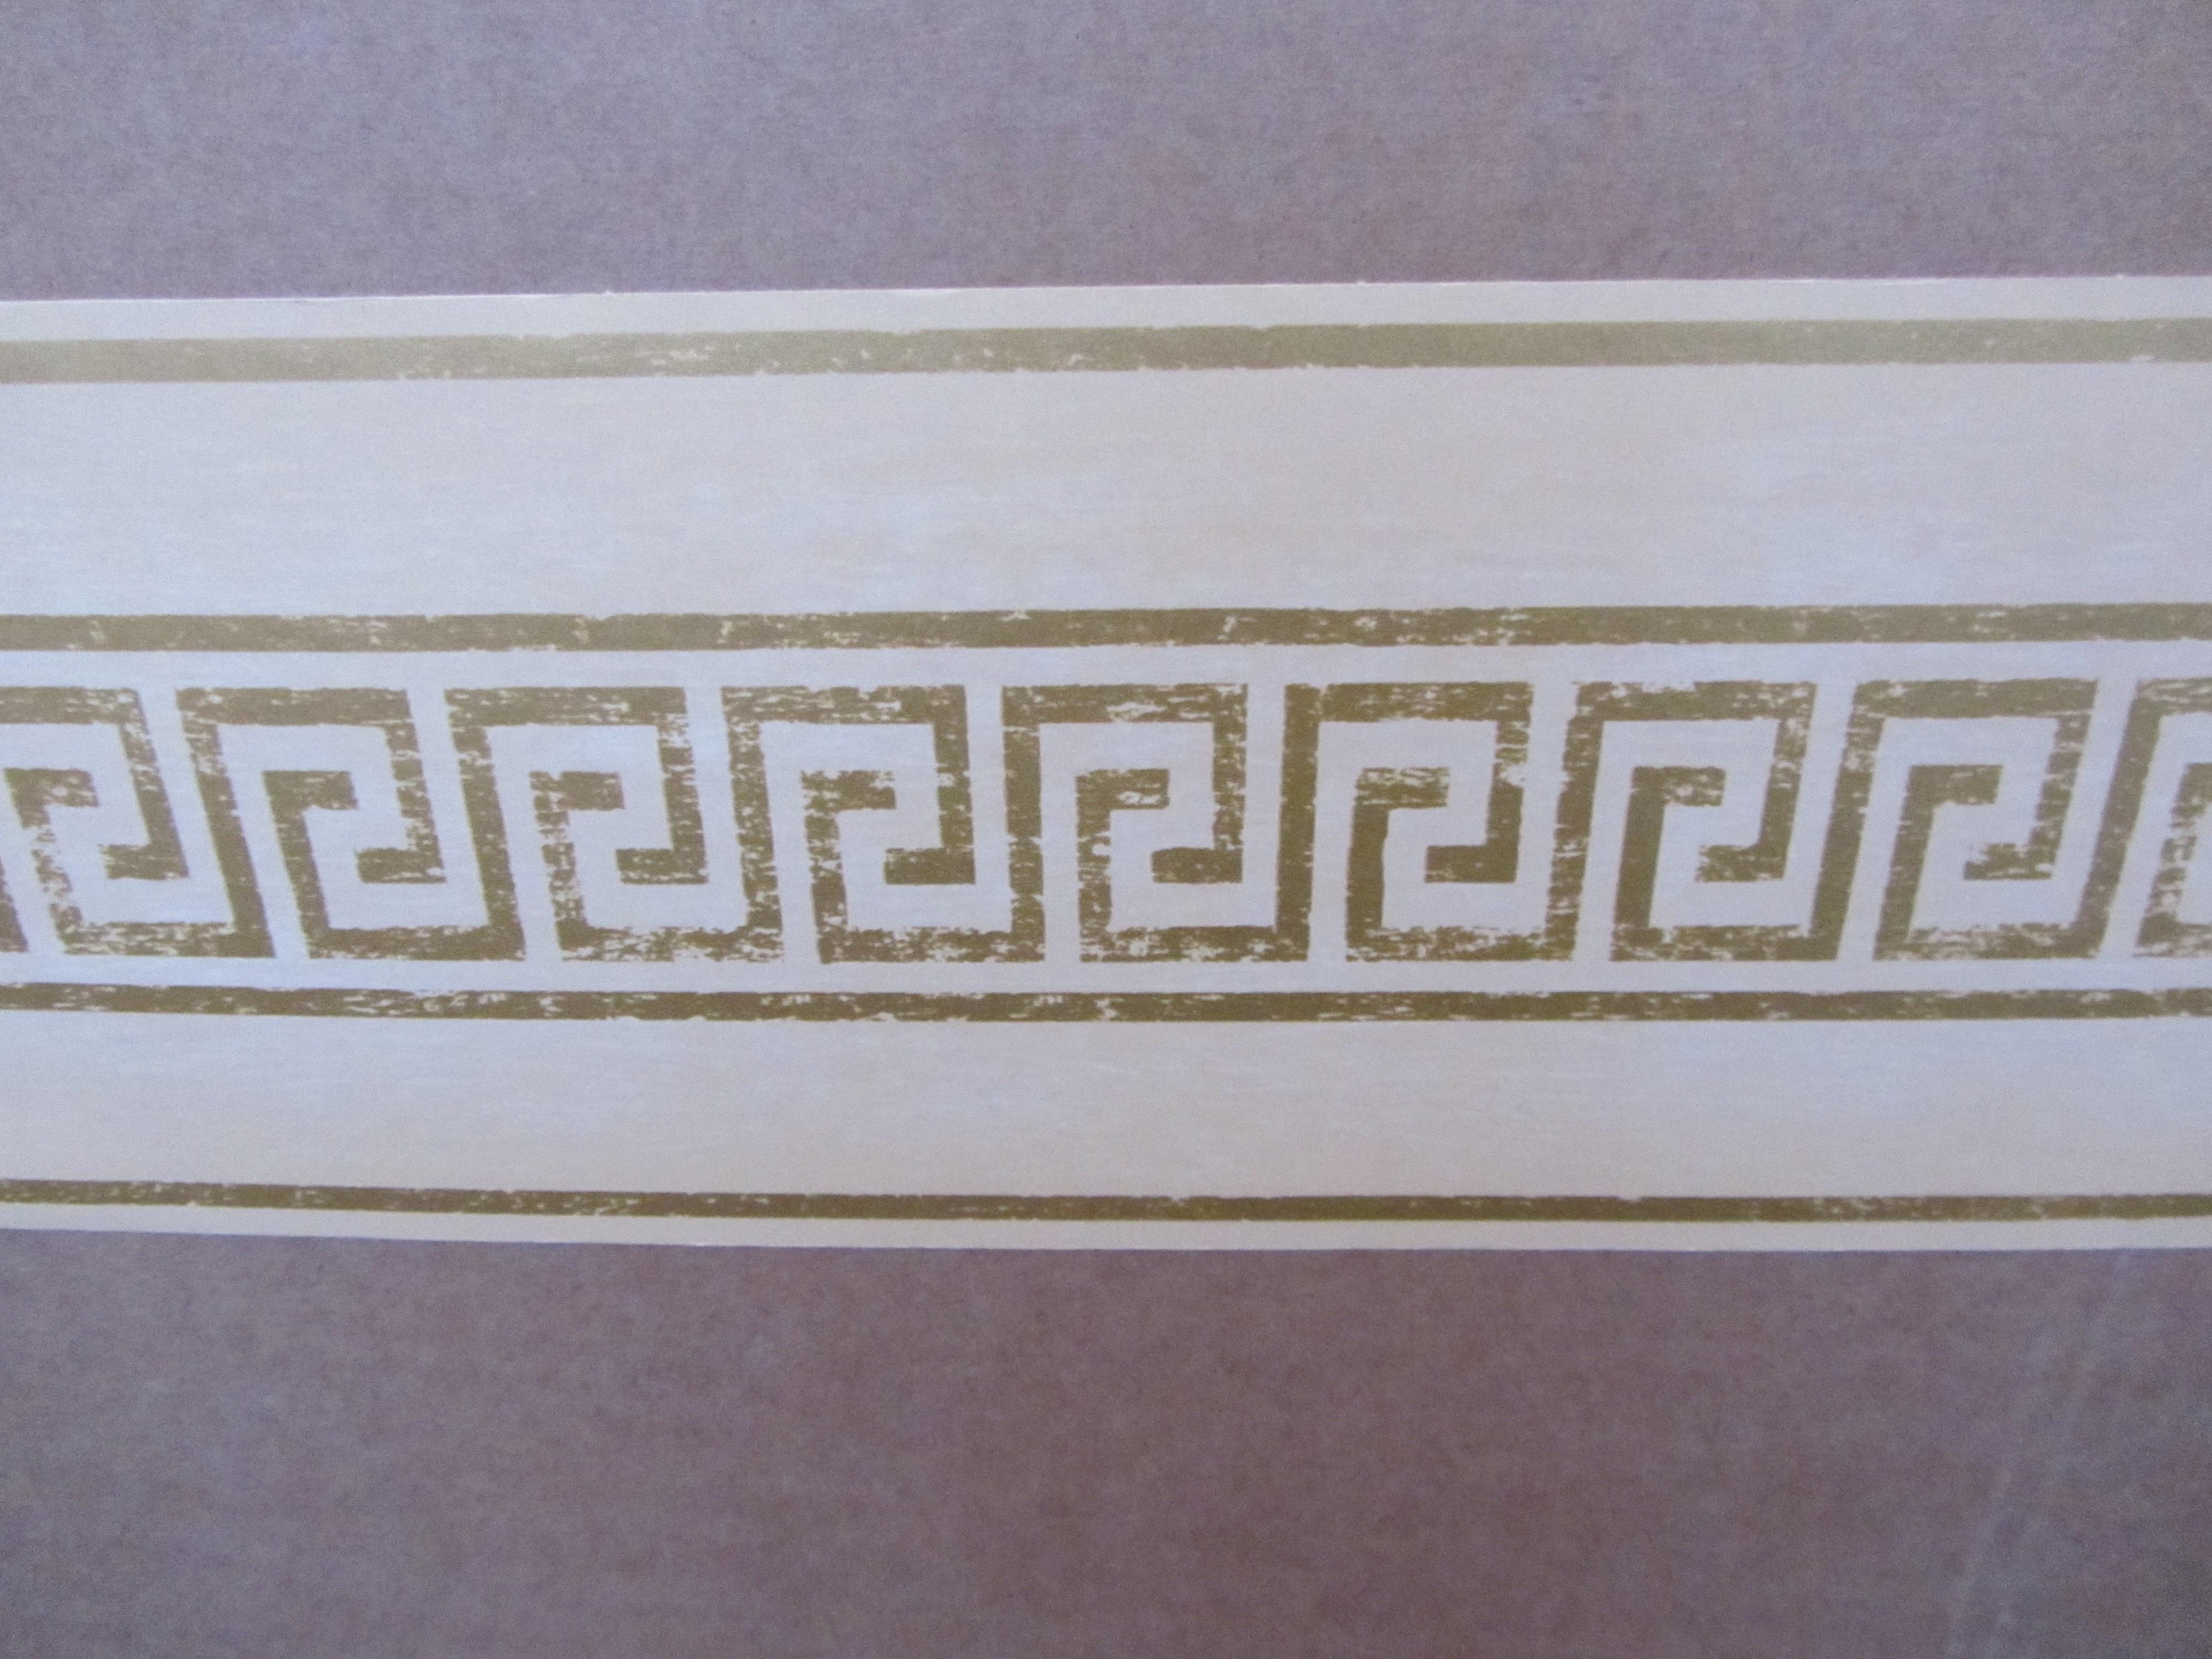 MODERN GREEK KEY CREAM WALLPAPER BORDER PATTERN SELF ADHESIVE HALLWAY 4000x3000